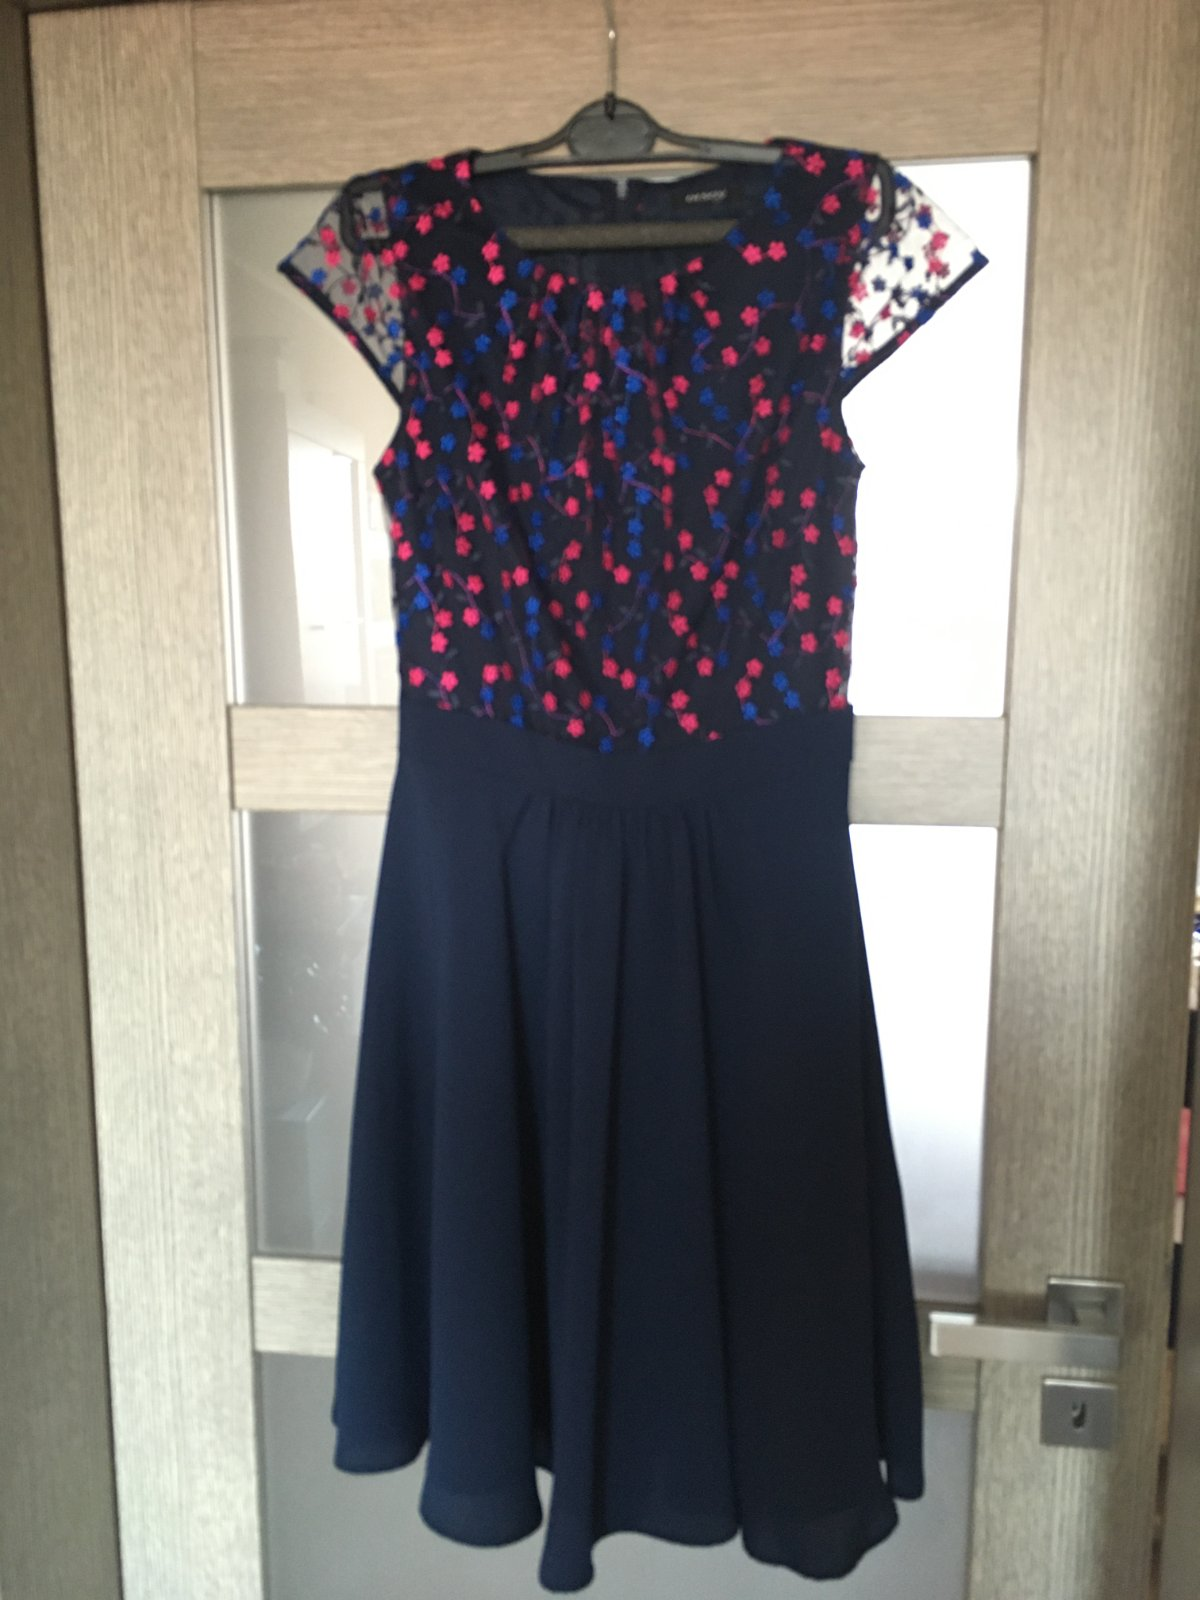 Tmavomodre kvietkovane šaty - Obrázok č. 1